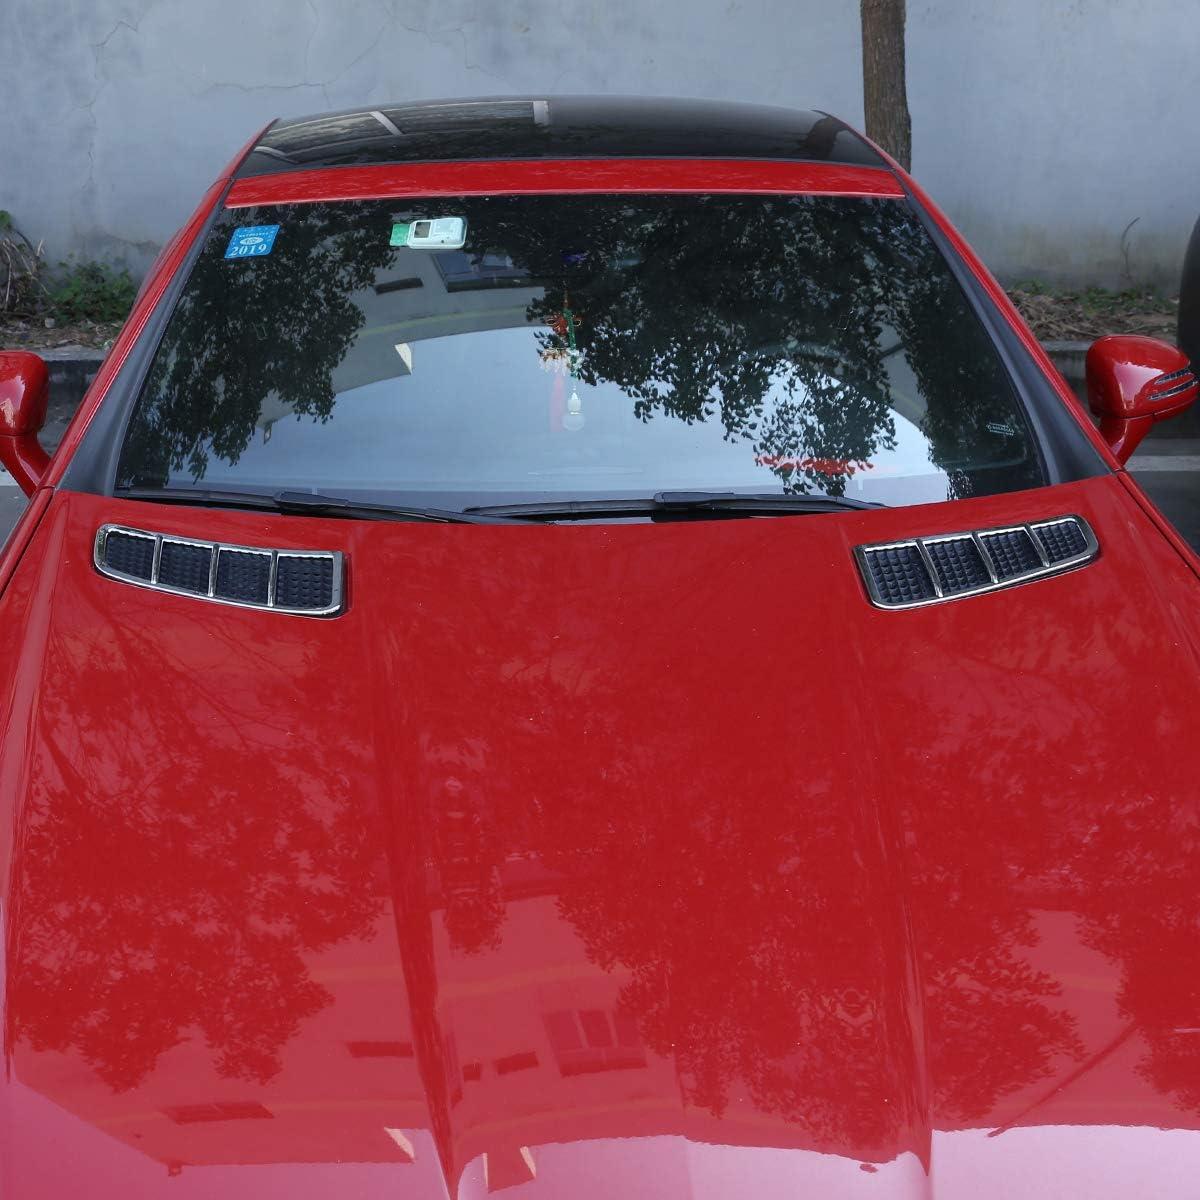 CHEYA ABS Chrome Engine Roof Hood Sticker Trim for Mercedes Benz SLK 200 2011 2012 2013 2014 2015 Silver